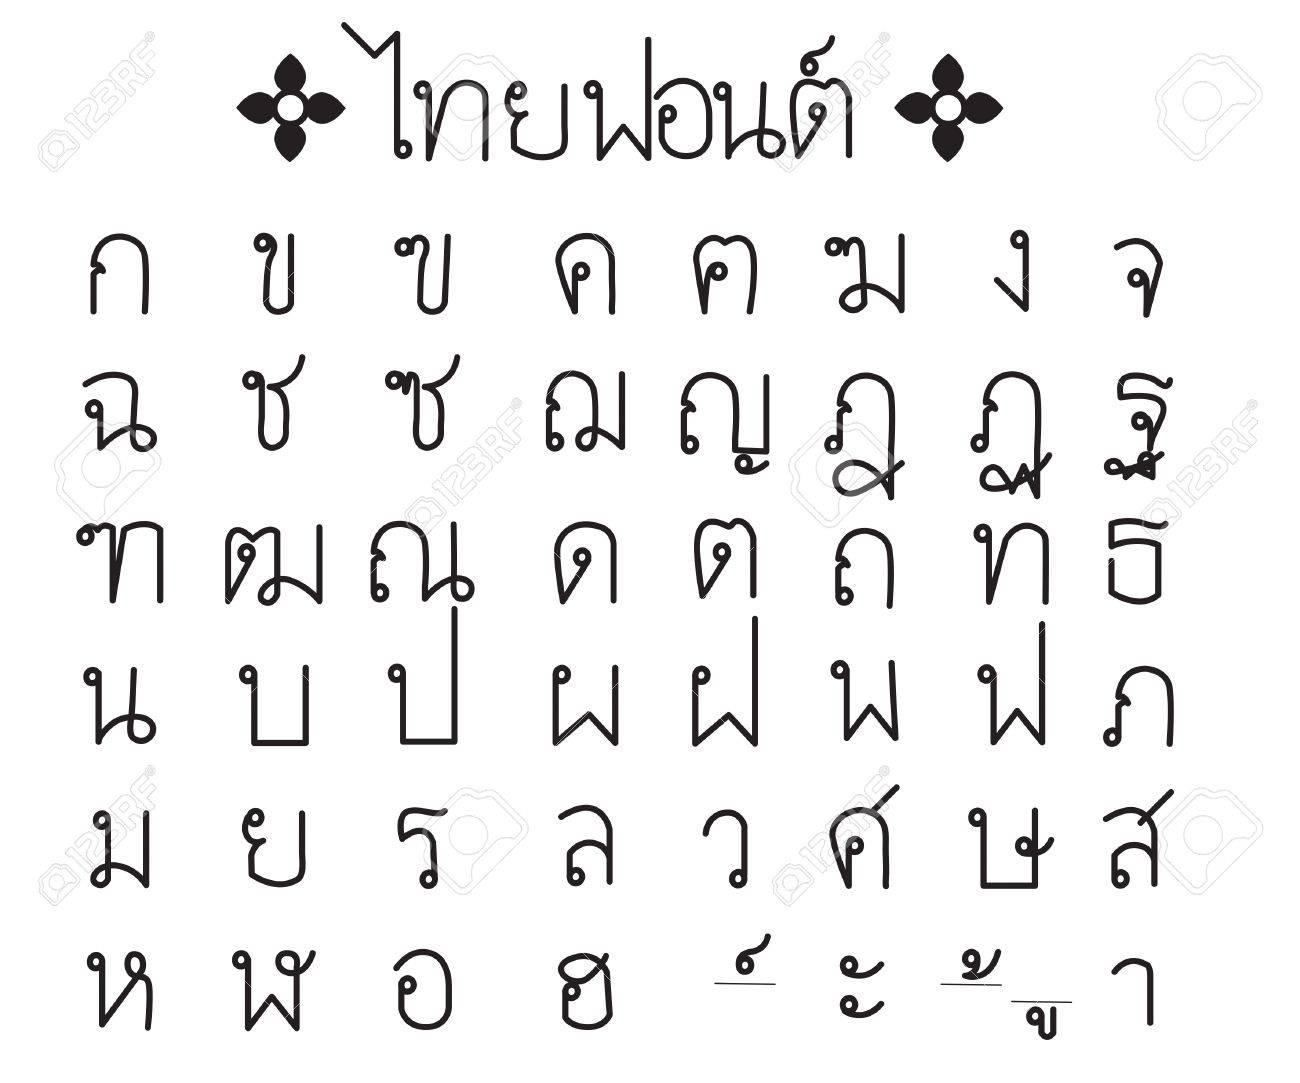 Looking for Thai language teacher